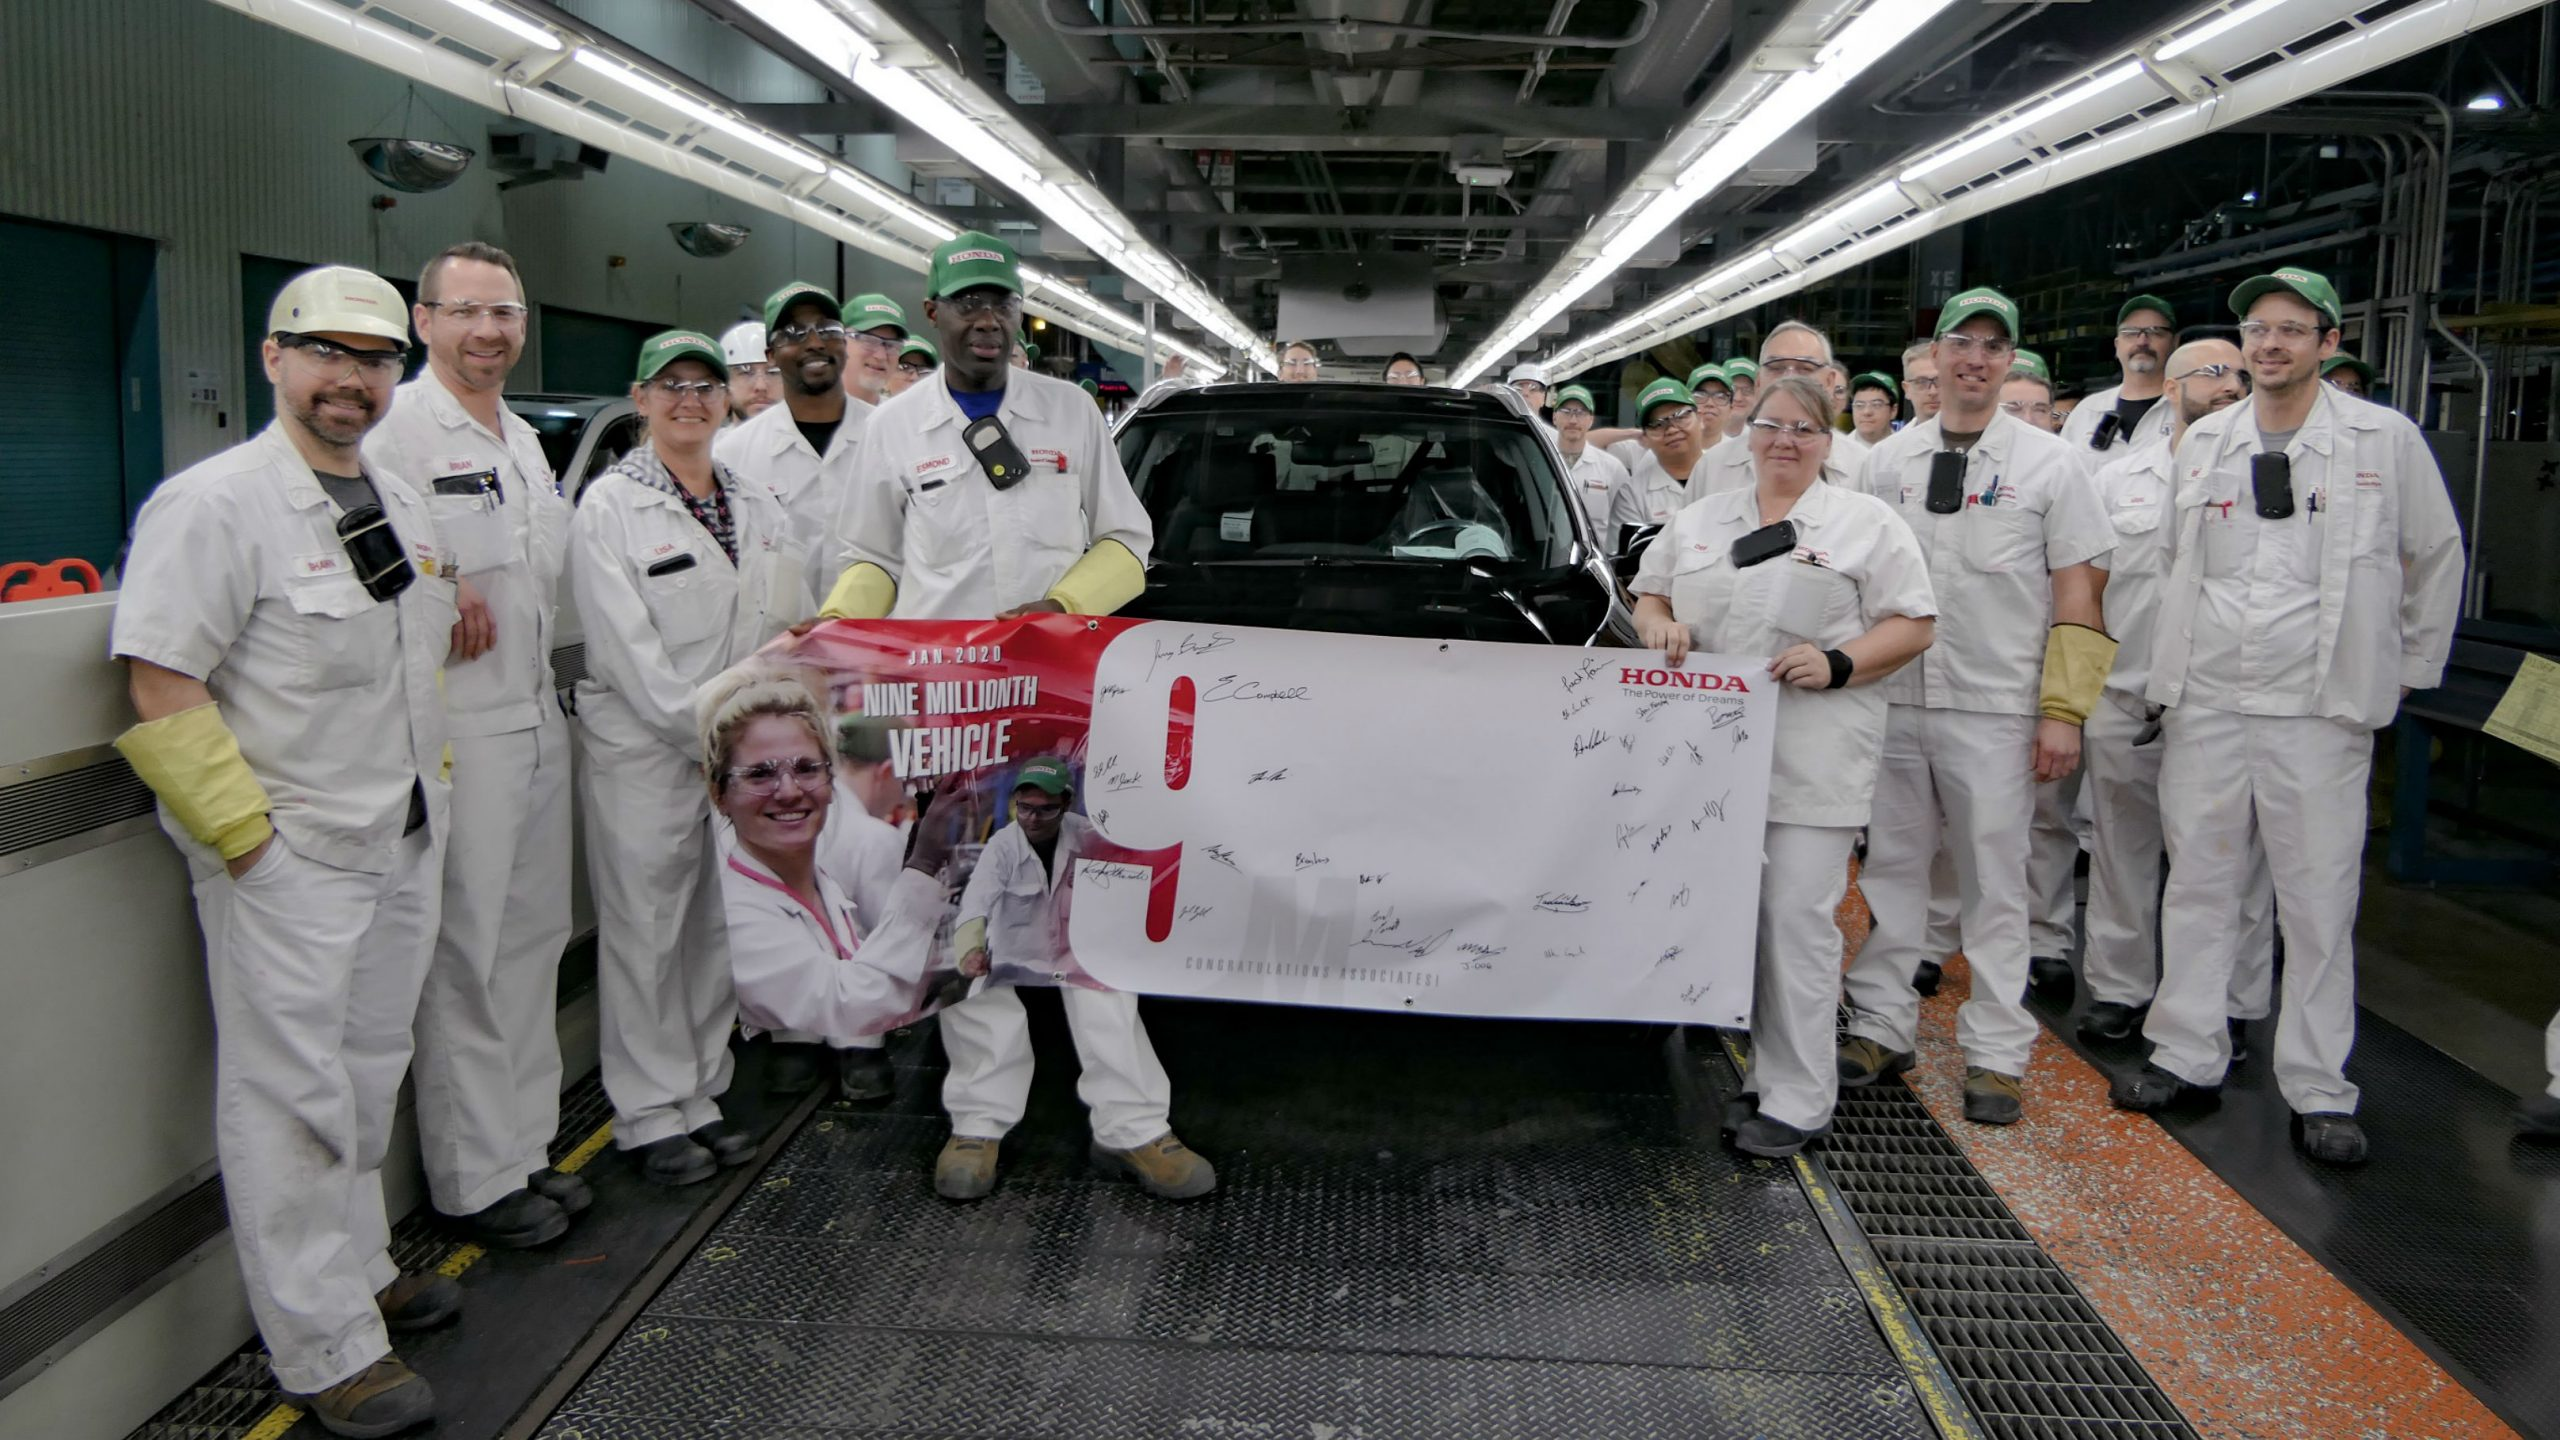 Honda of Canada Mfg. builds nine-millionth vehicle in Ontario